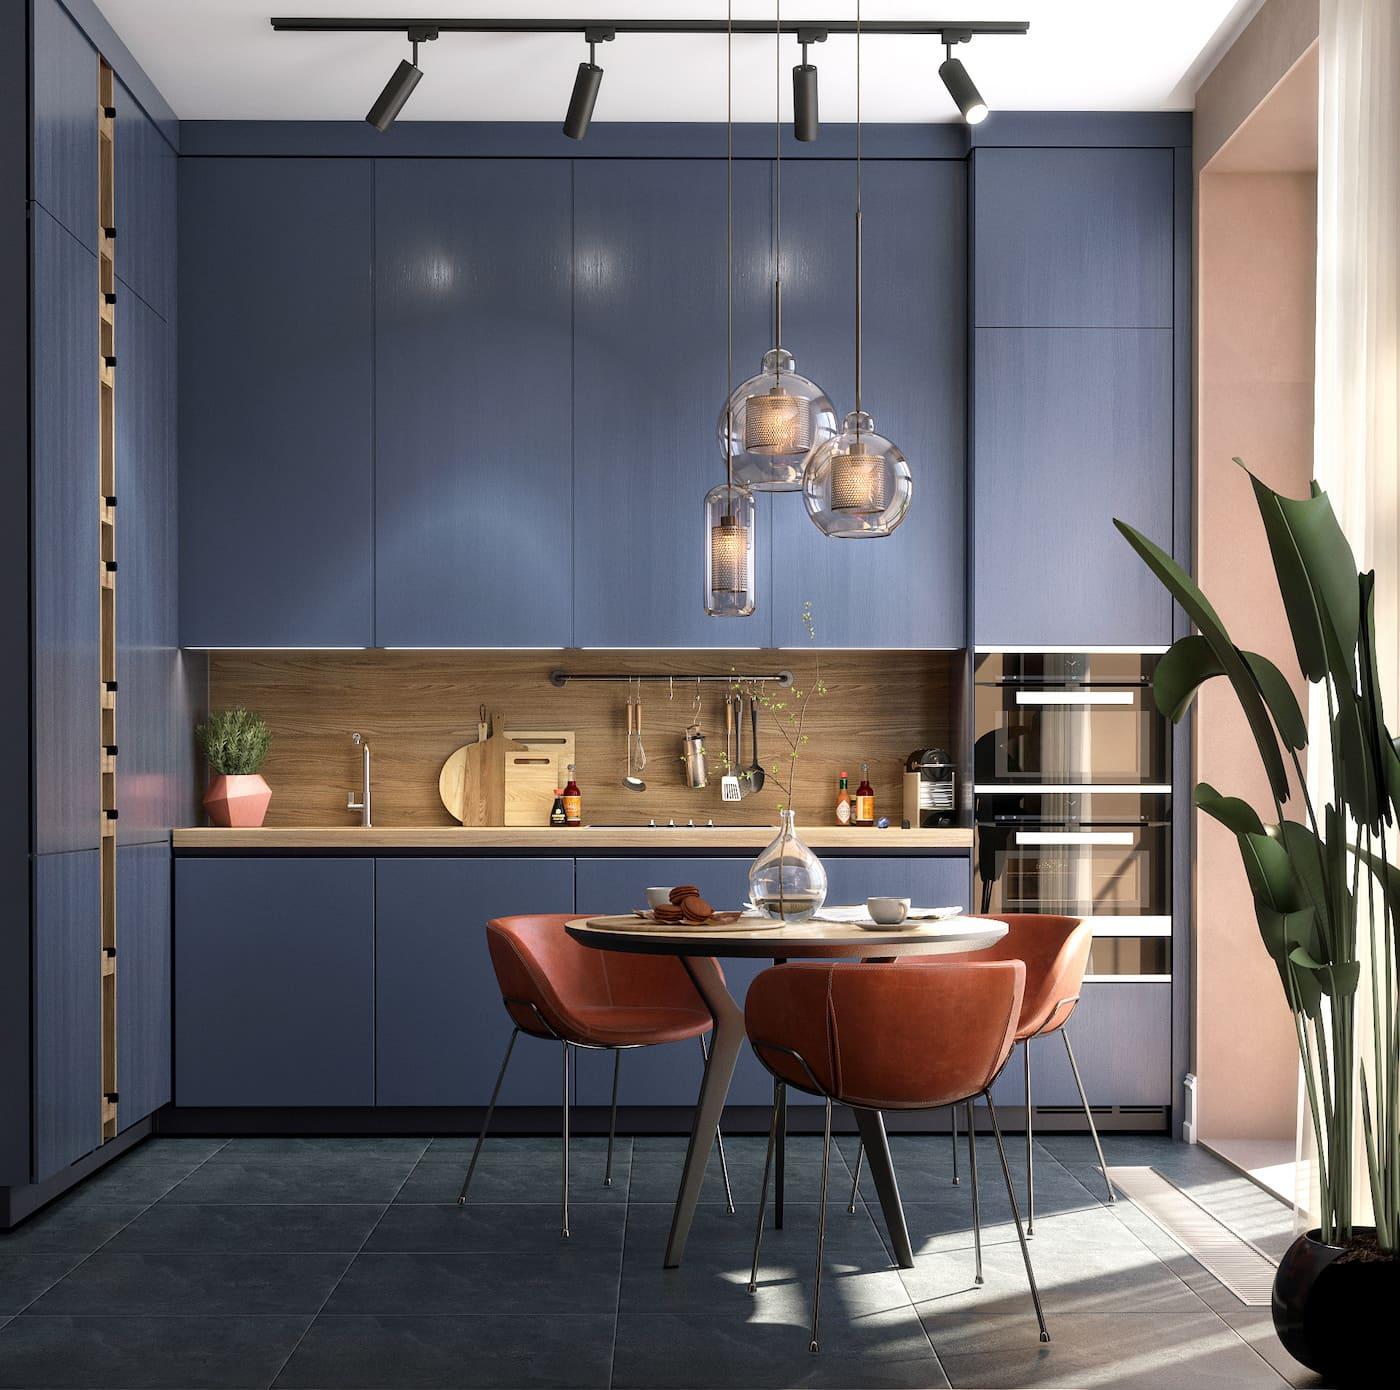 дизайн однокомнатной квартиры фото 12